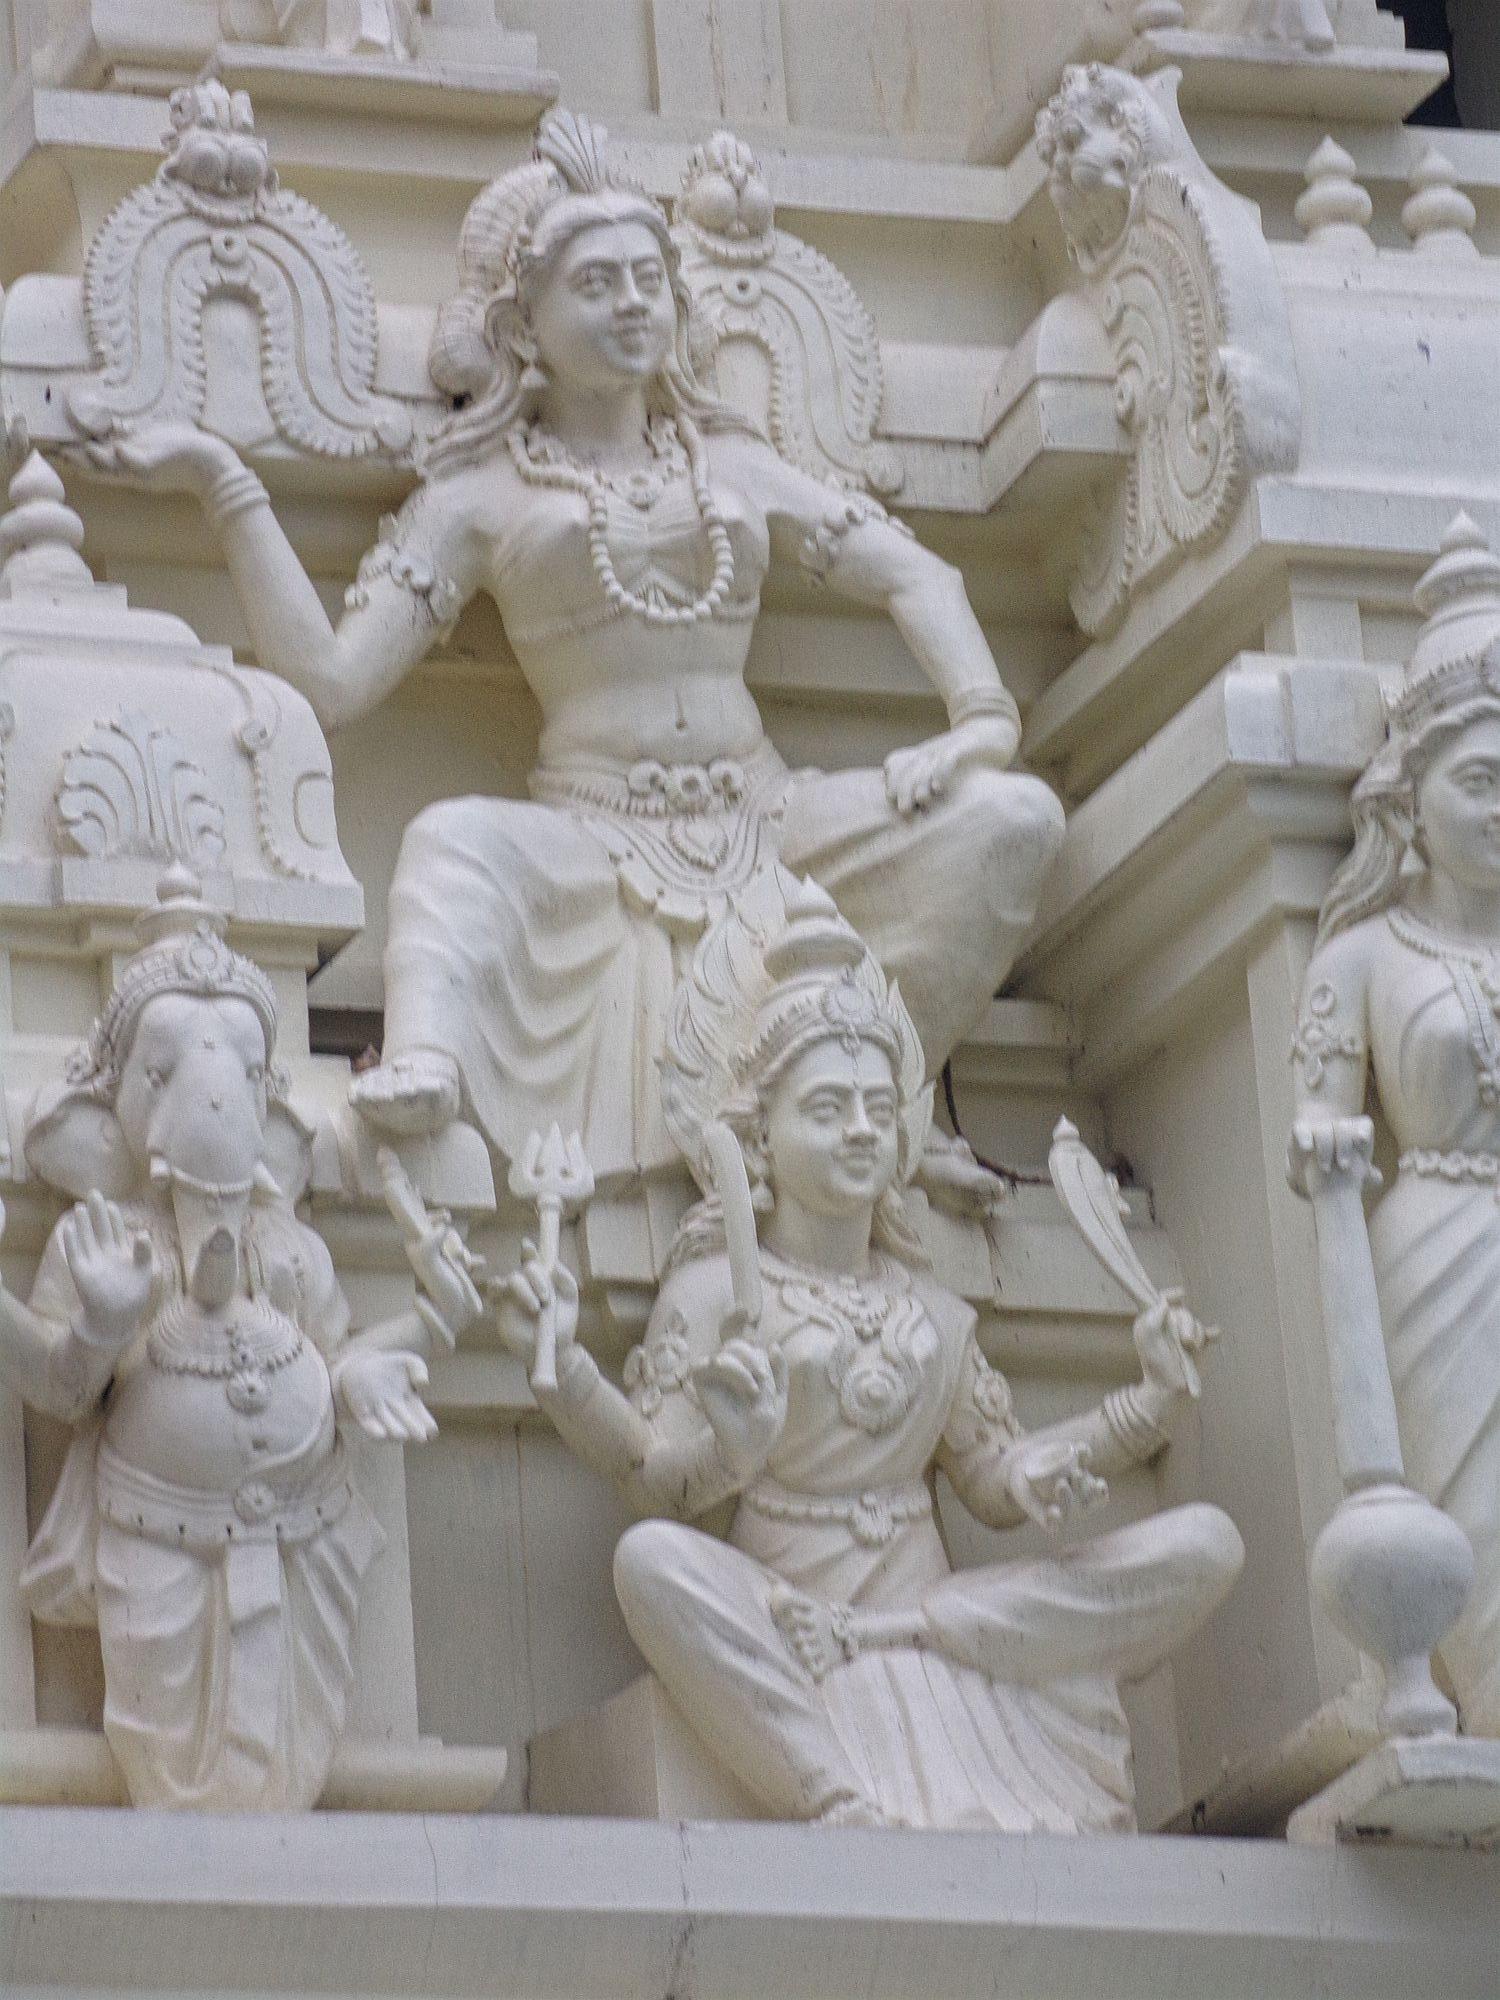 chennai temple recit voyage émeute inde